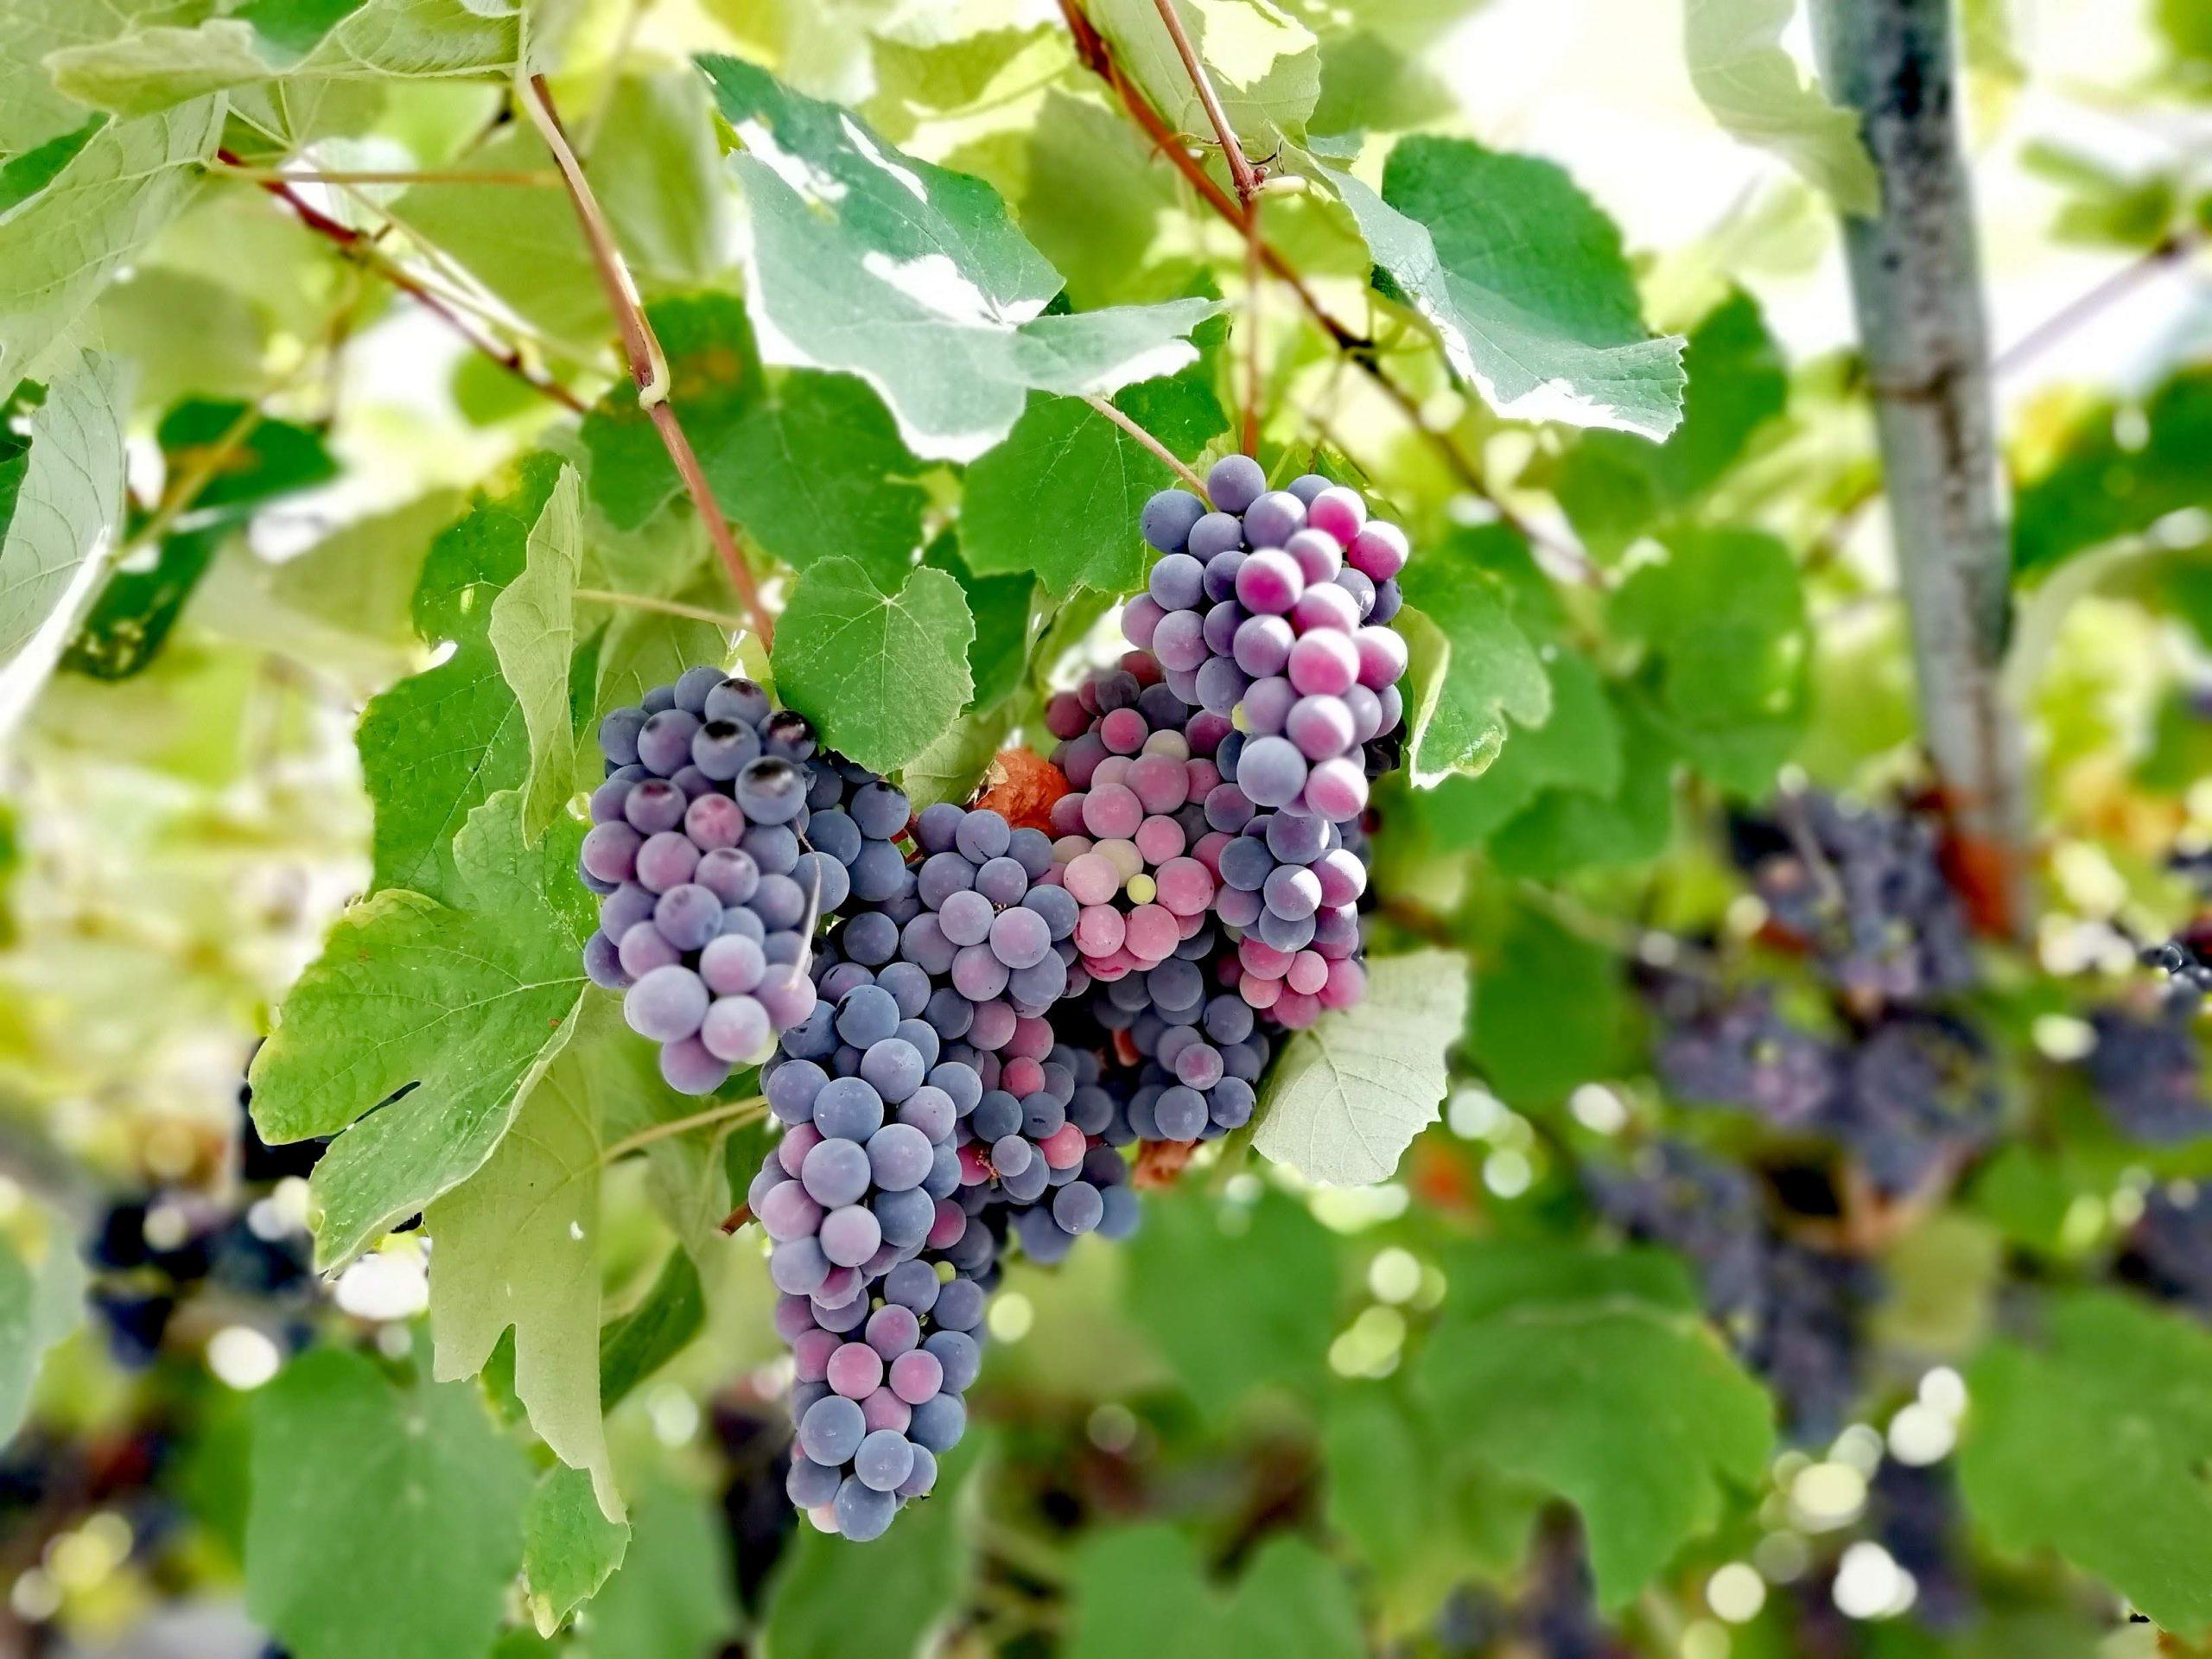 Winogrona greckie